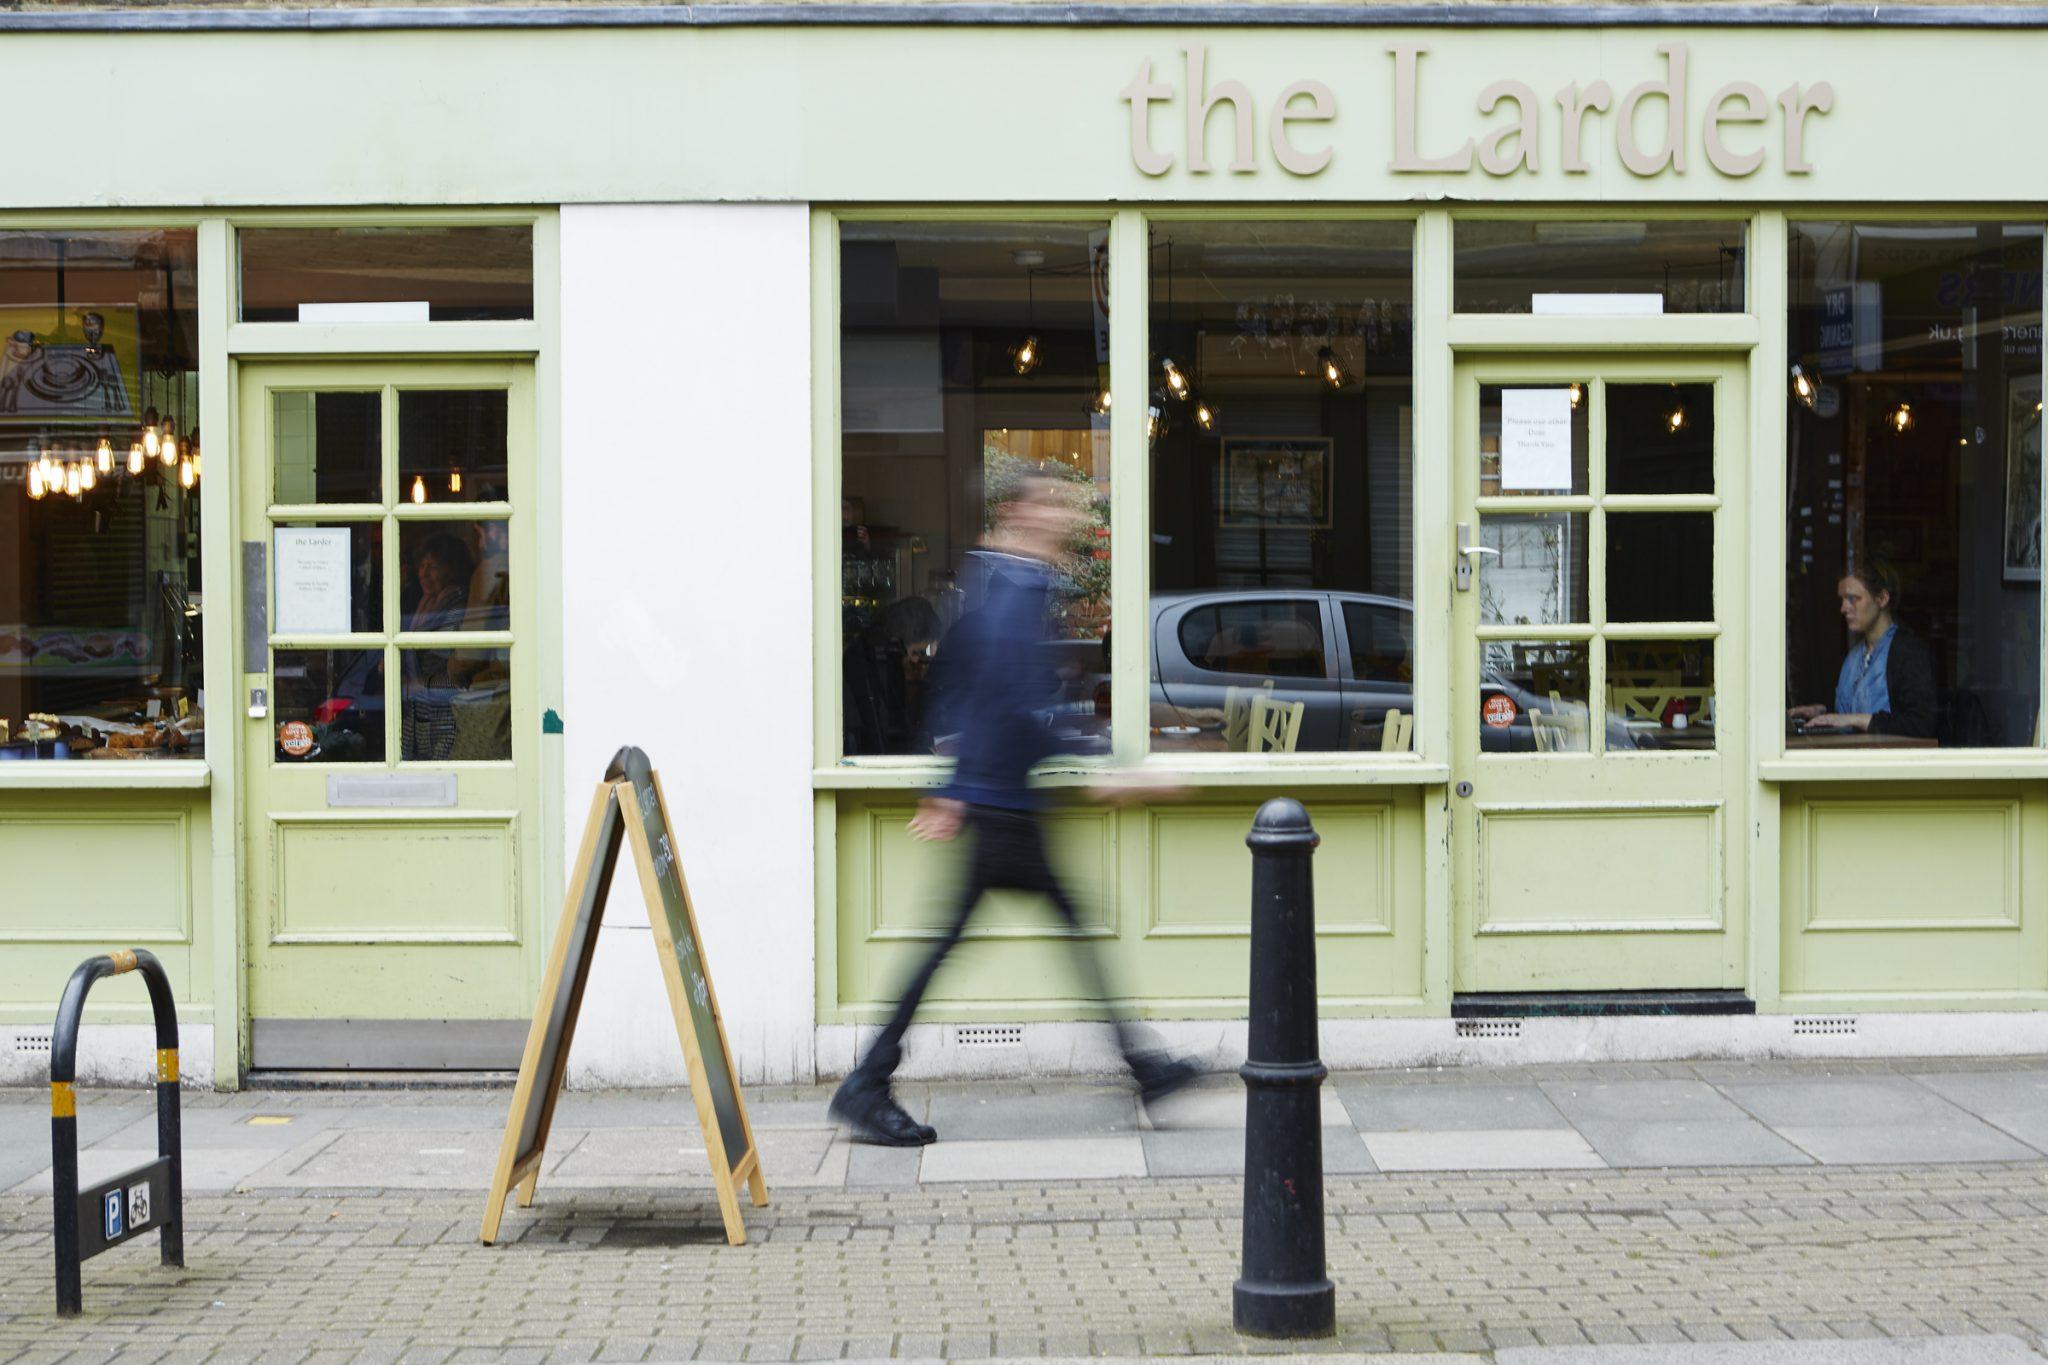 The Larder, Bethnal Green